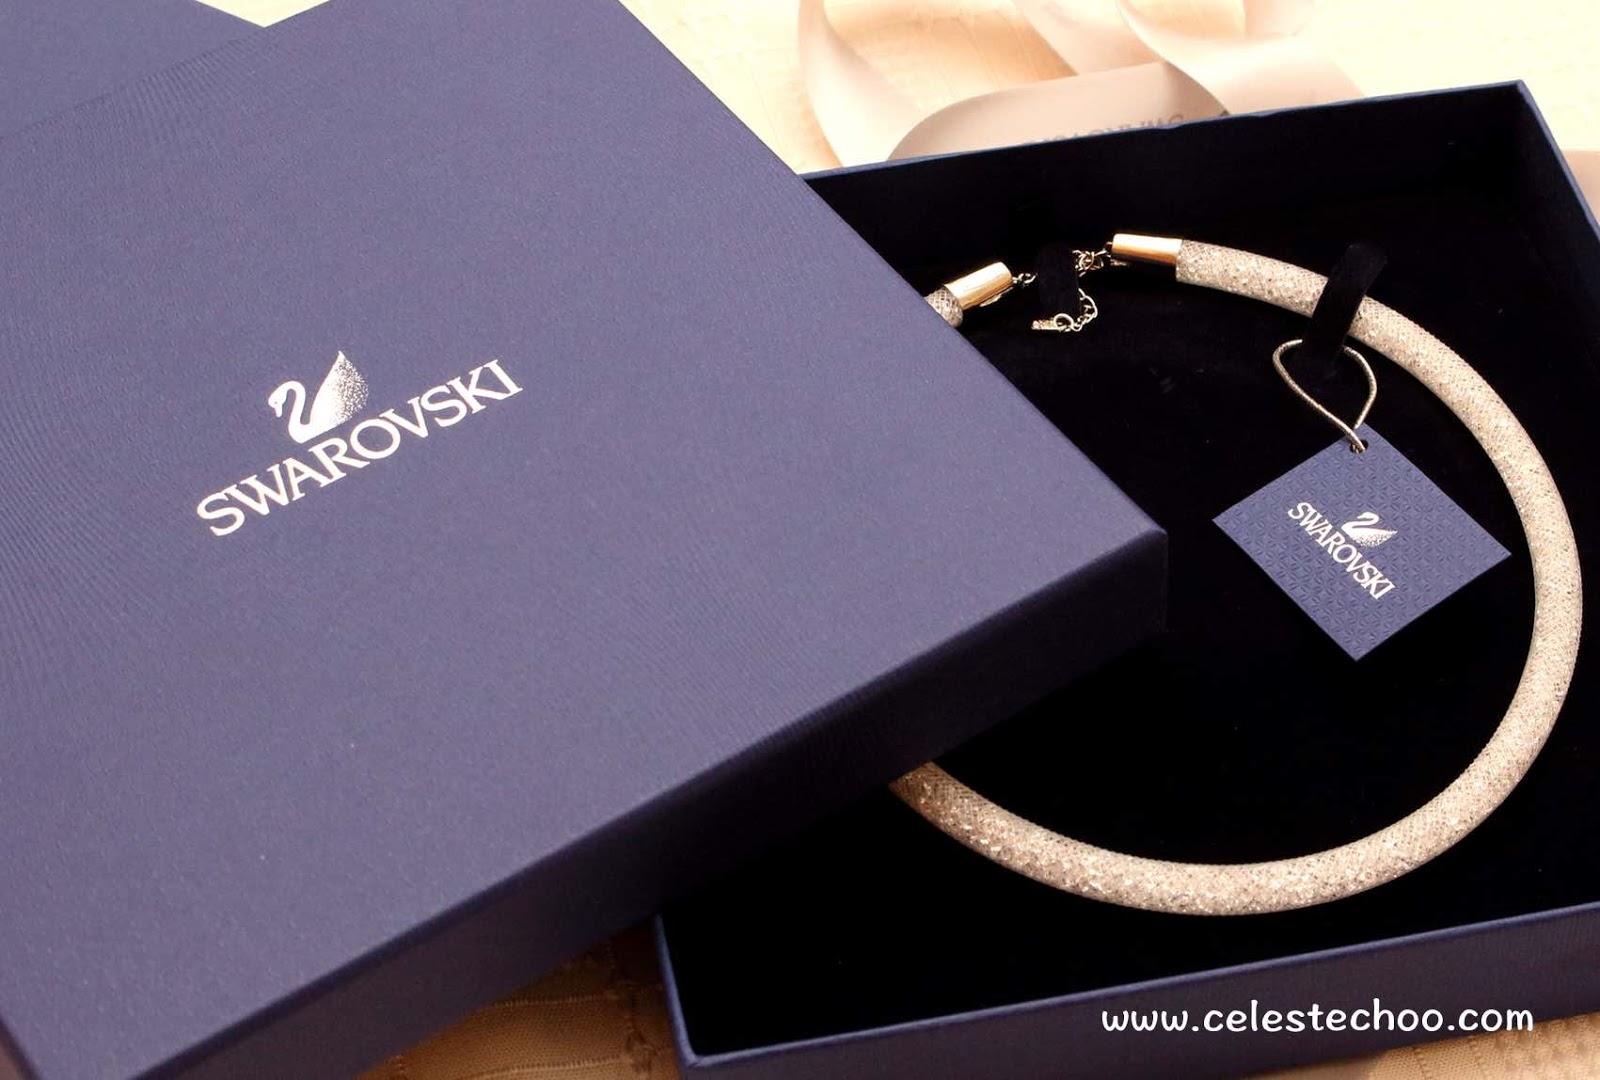 75dc56d80fc8 CelesteChoo.com  Swarovski Stardust Fashion Necklace